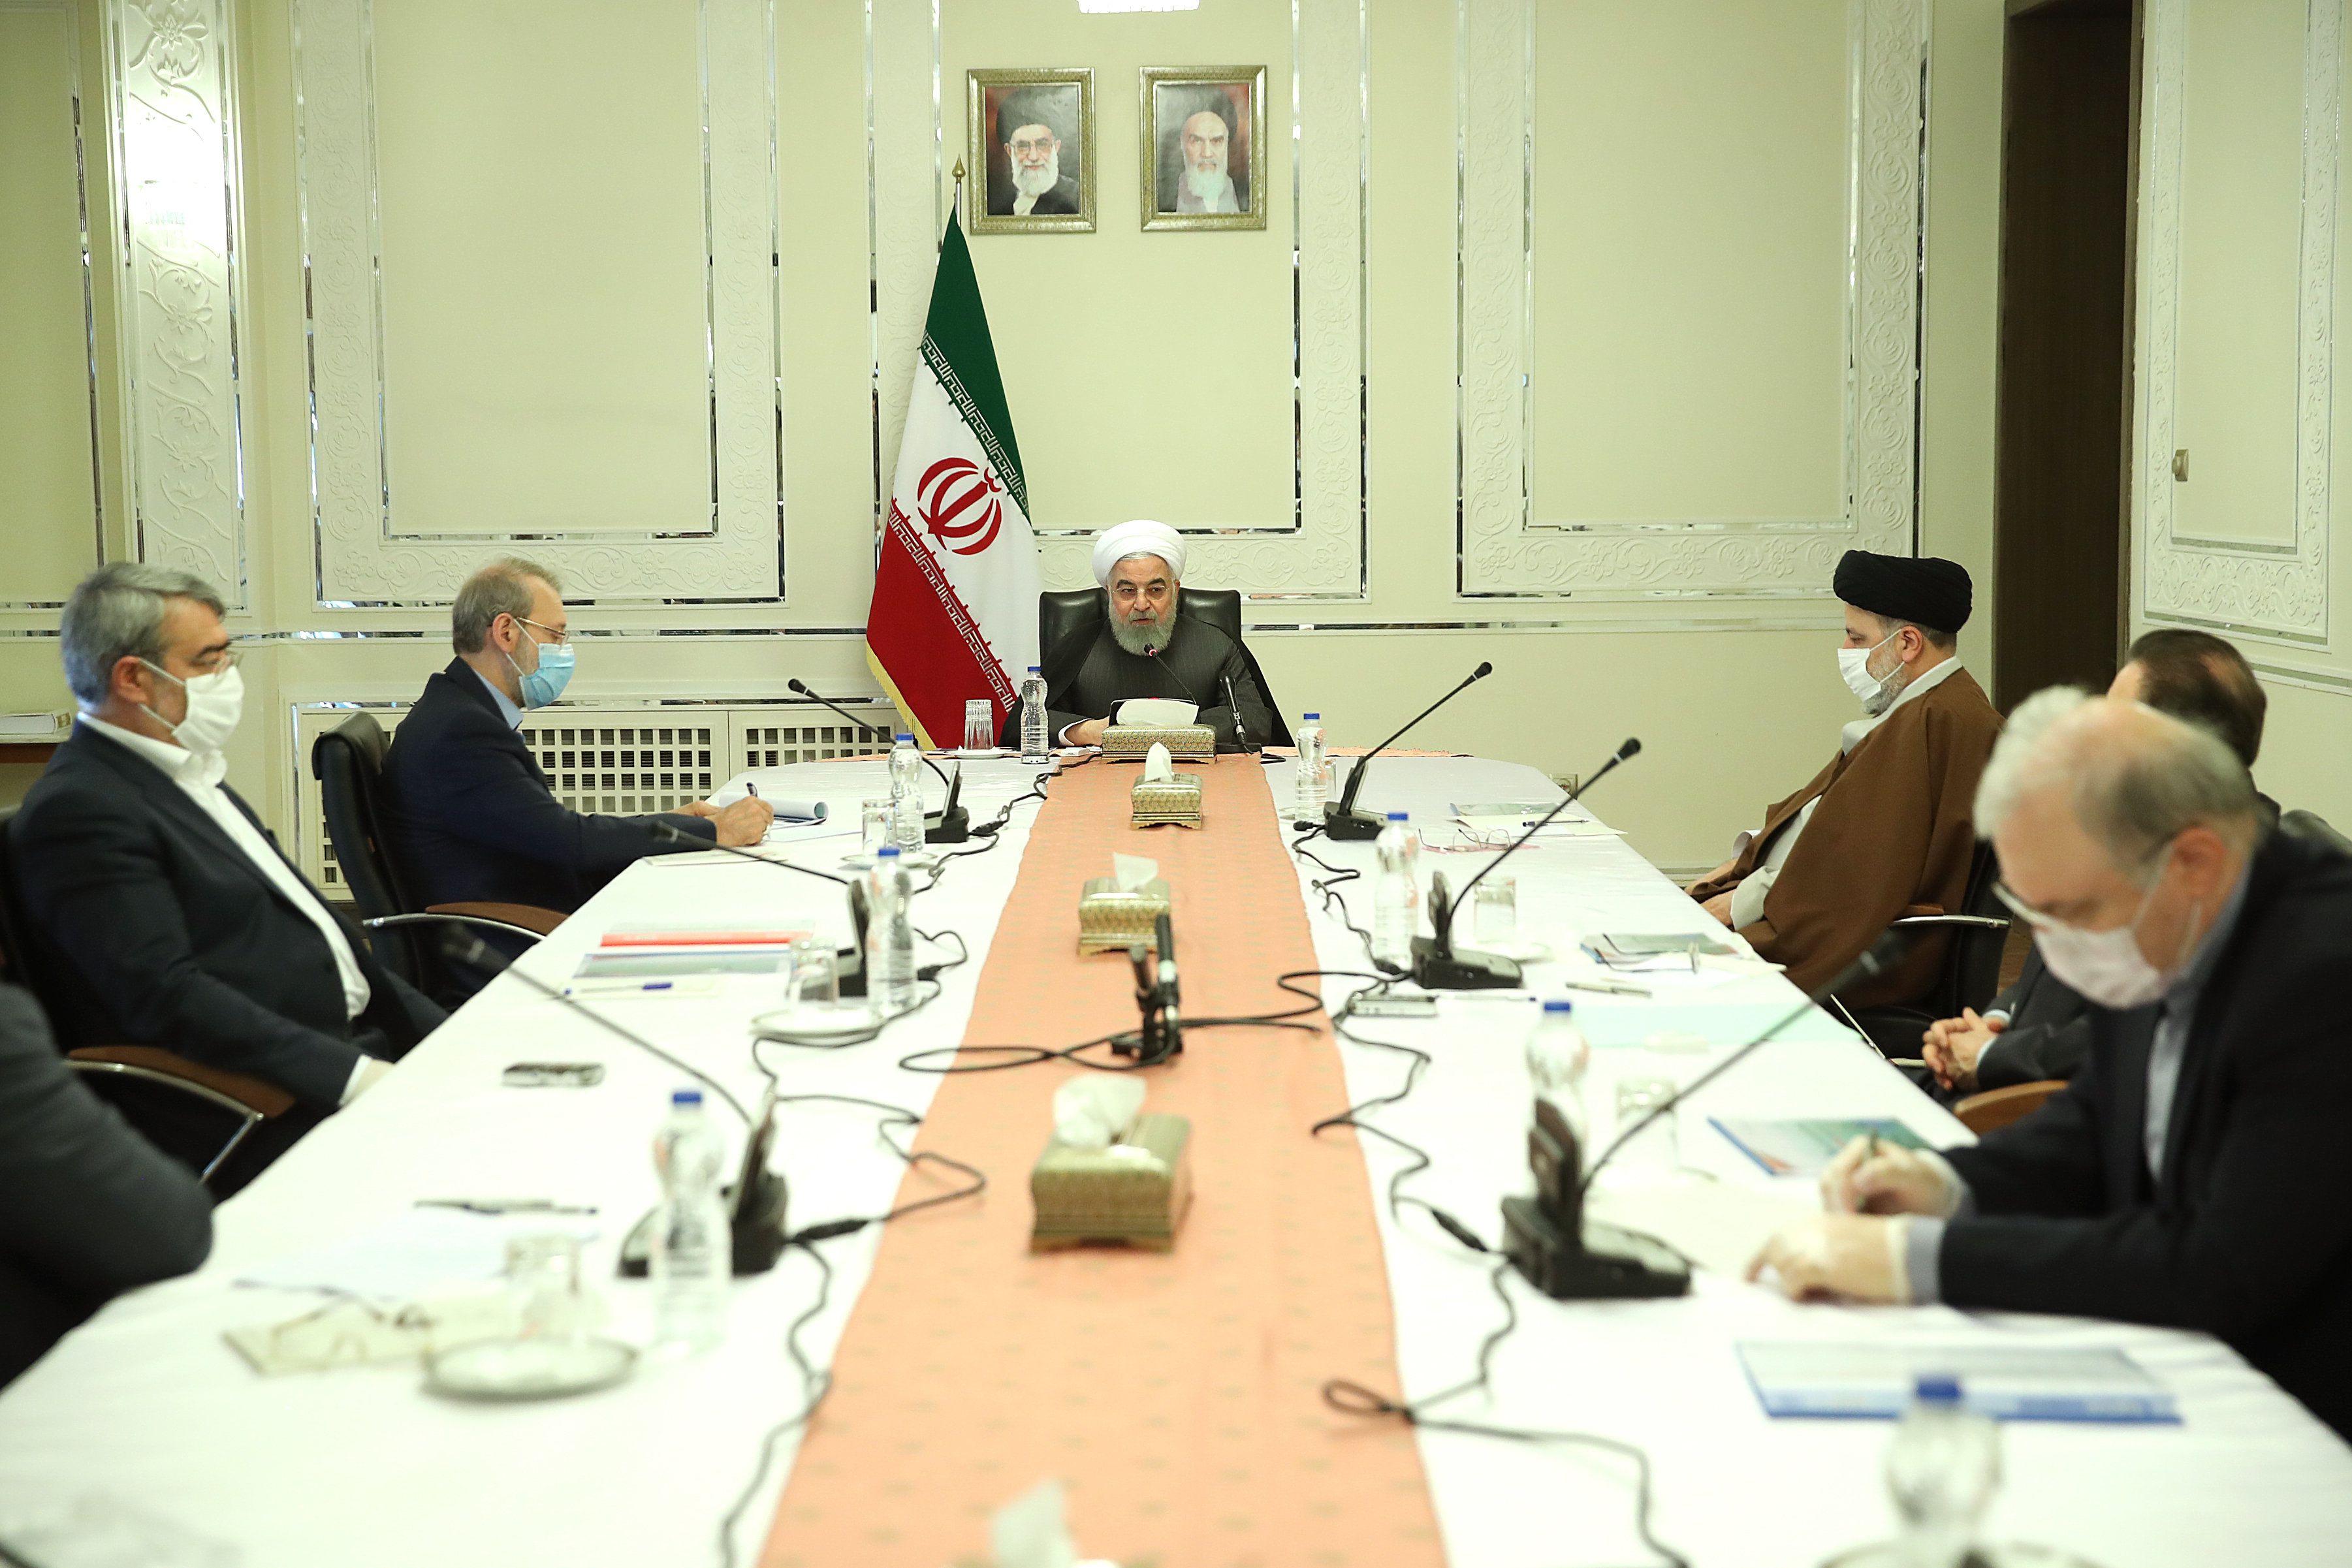 Coronavirus Politics Daily: Iran's anguish, Gaza on the brink, Orban pulls a fast one